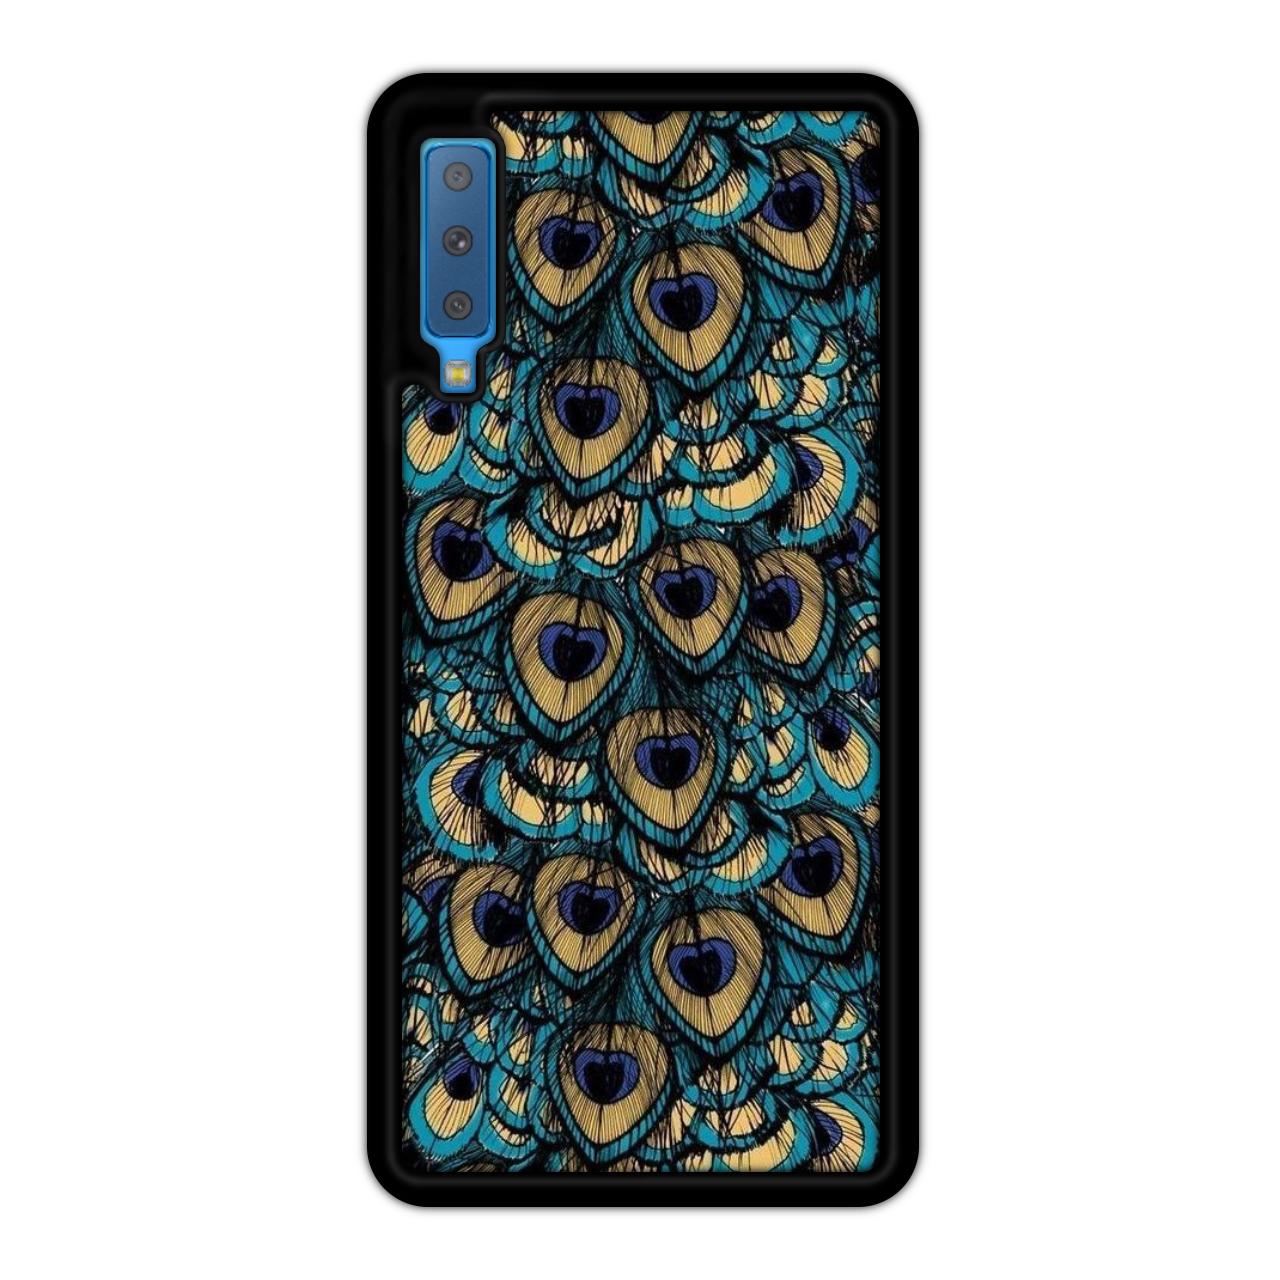 کاور آکام مدل Aasev1560 مناسب برای گوشی موبایل سامسونگ Galaxy A7 2018